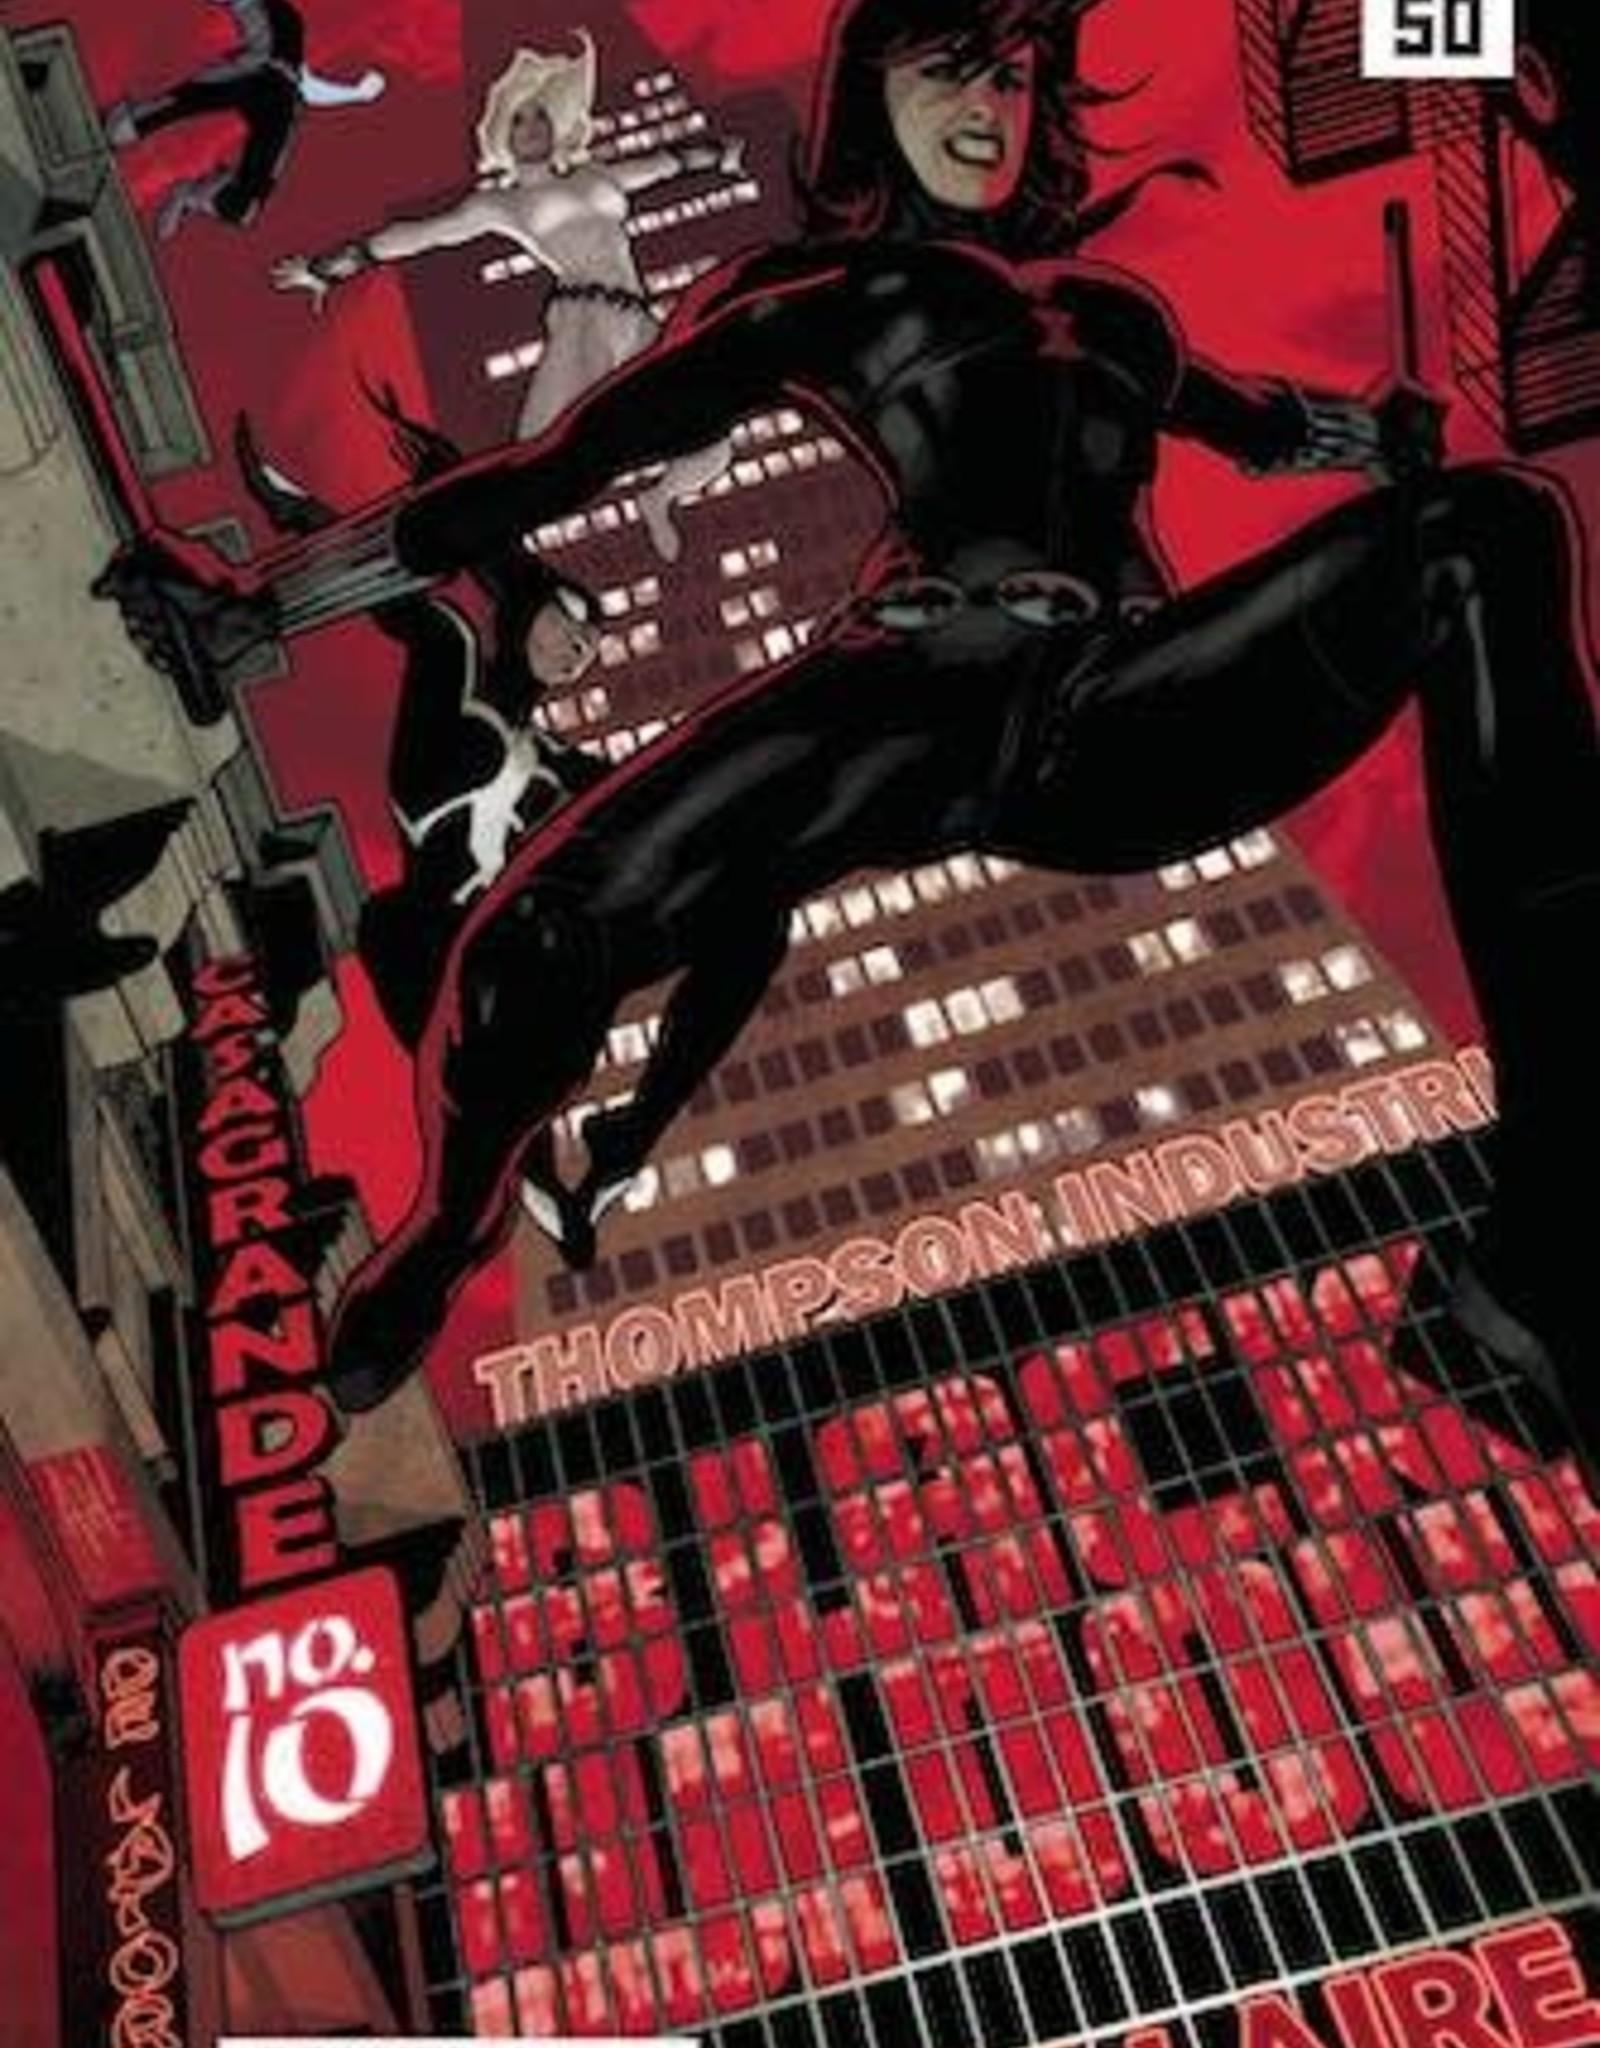 Marvel Comics Black Widow #10